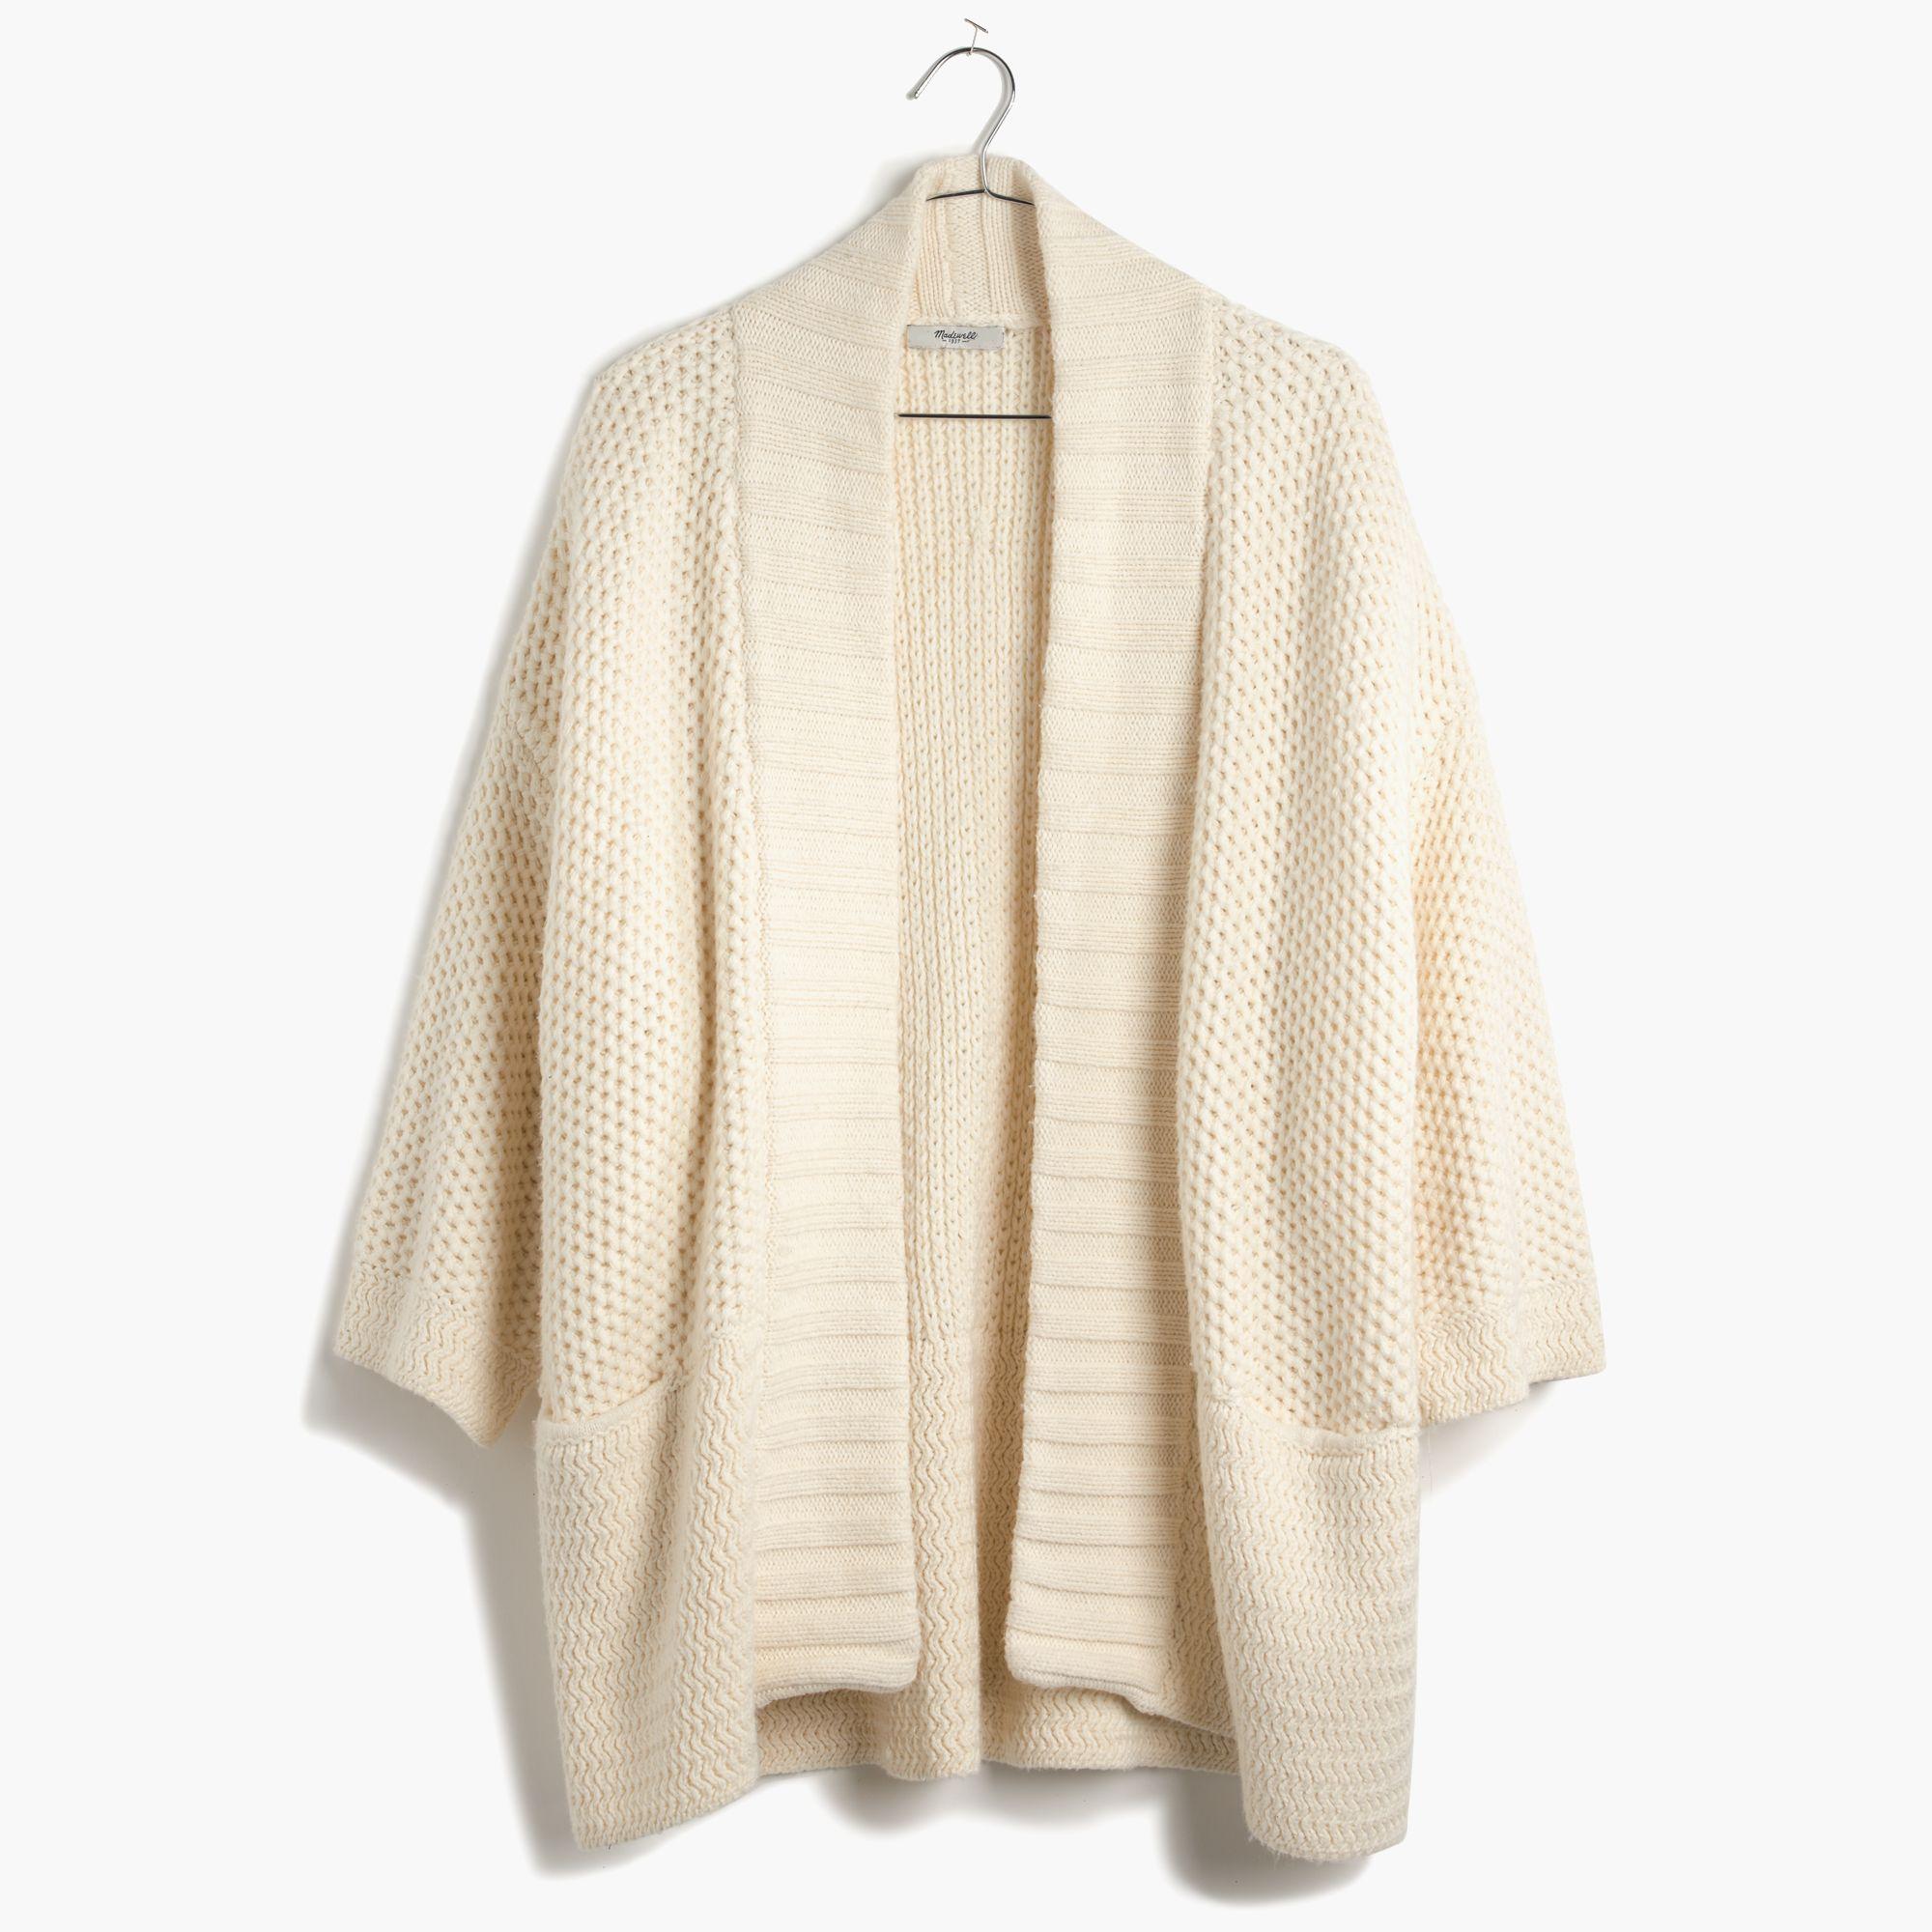 Madewell Kimono Cardigan Sweater in Natural | Lyst